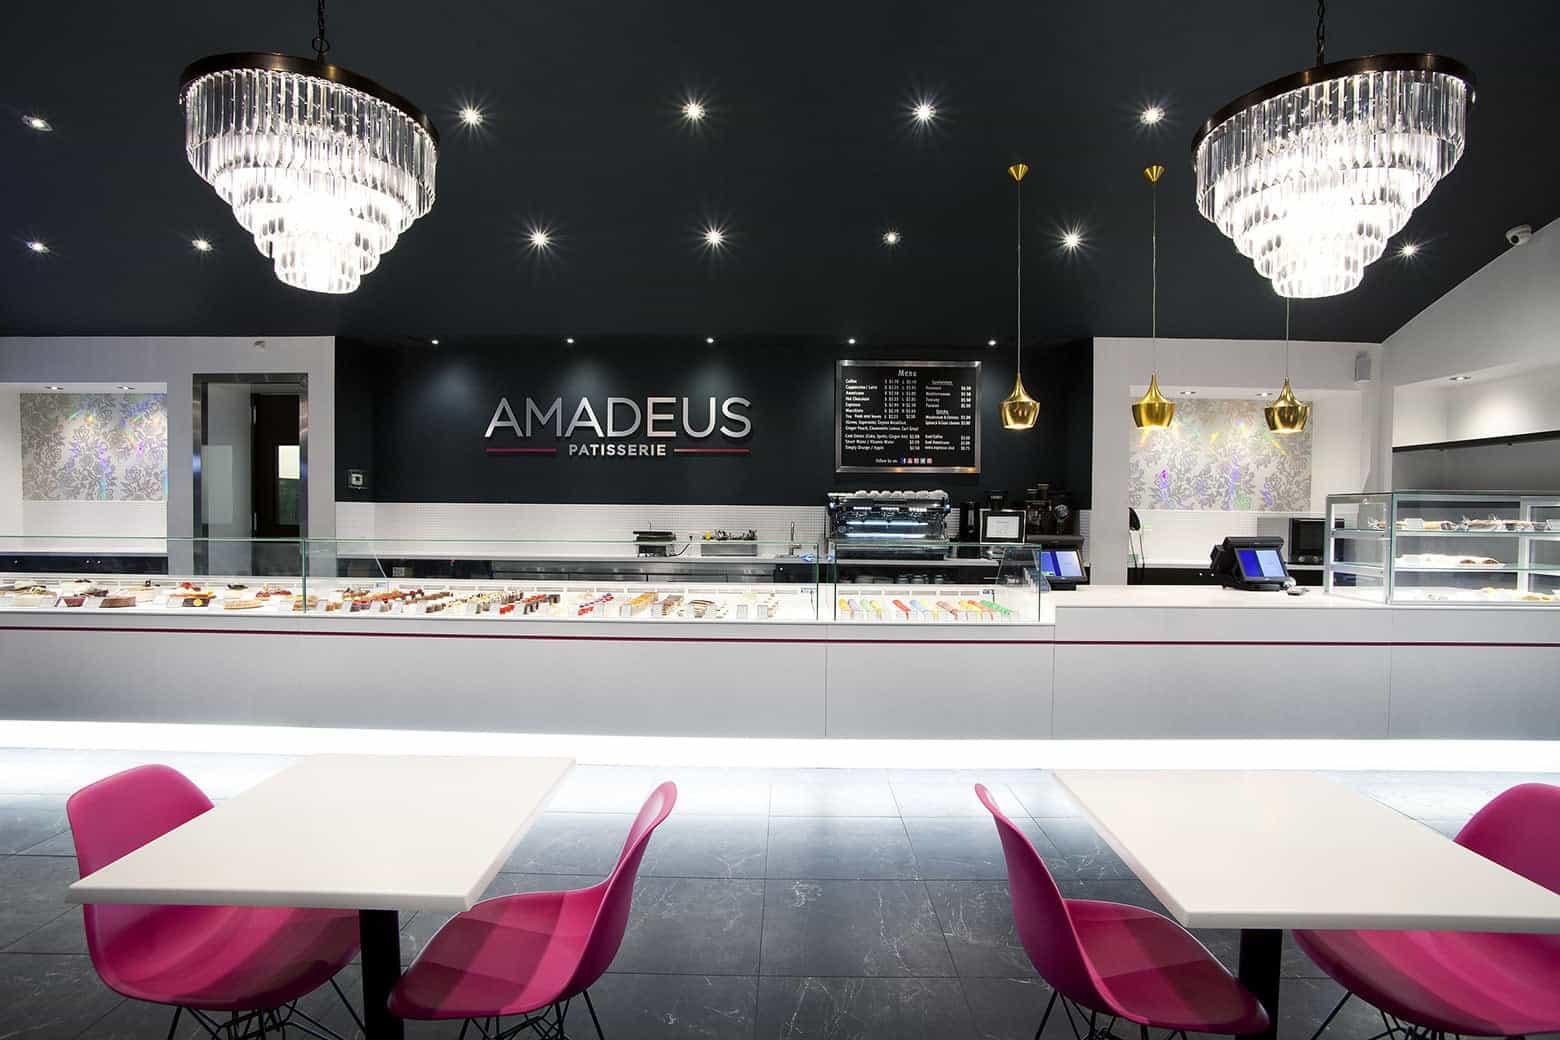 amadeus-pattisserie-toronto